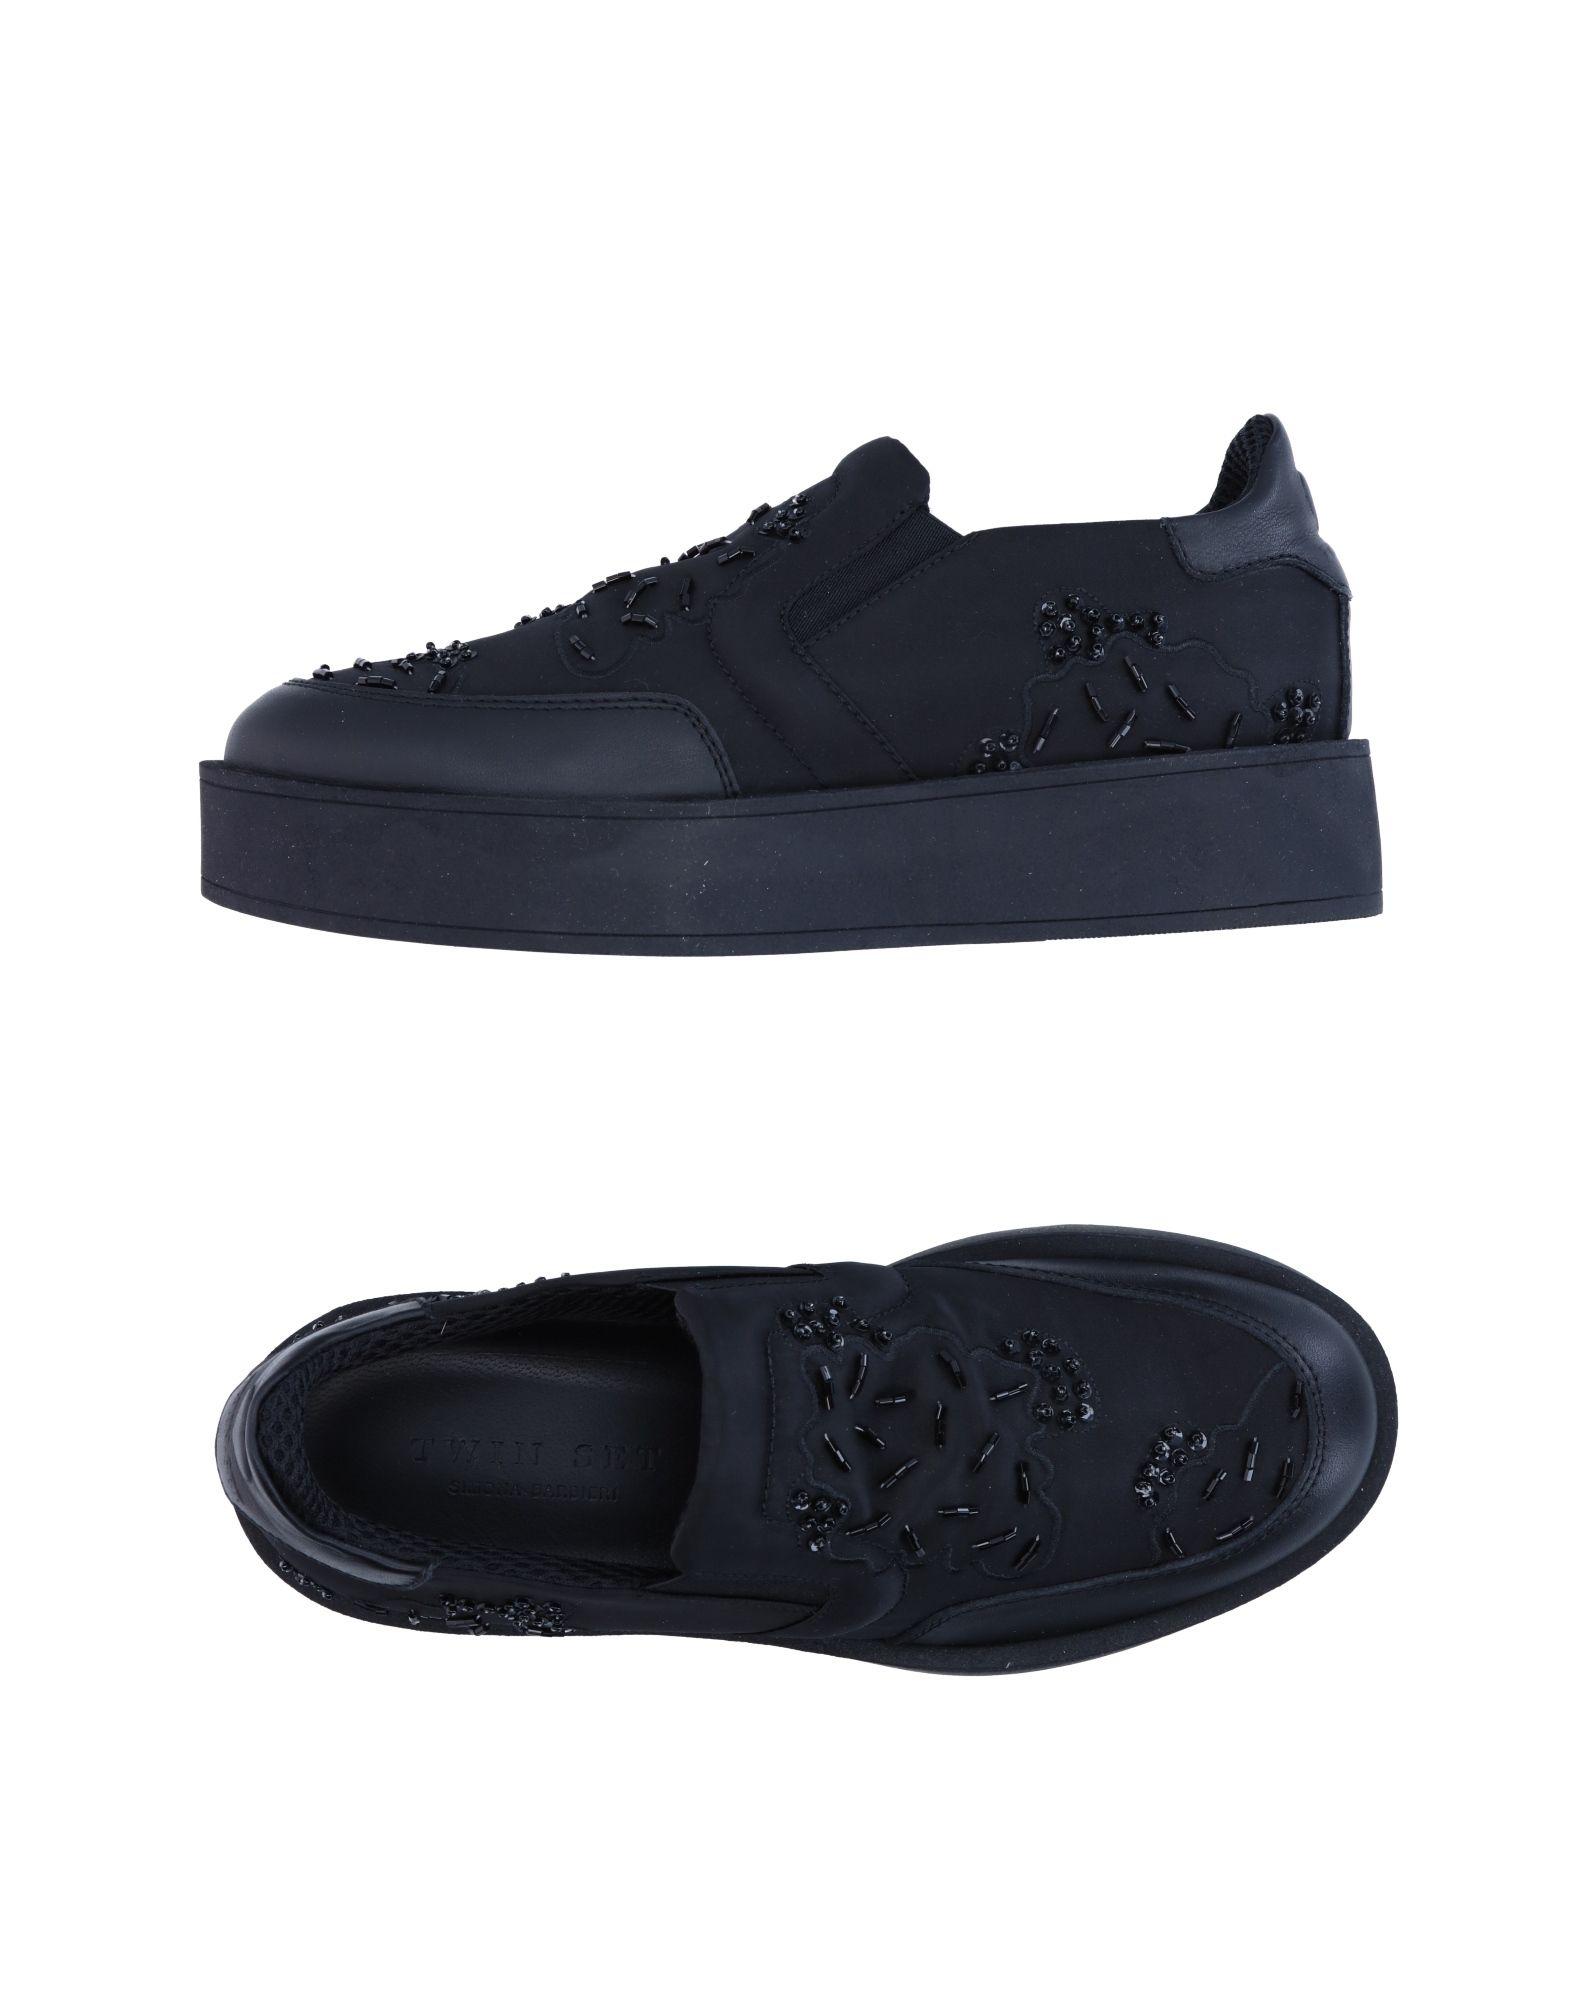 Twin-Set Simona Barbieri Simona Sneakers - Women Twin-Set Simona Barbieri Barbieri Sneakers online on  Canada - 11277250HX 6f0008